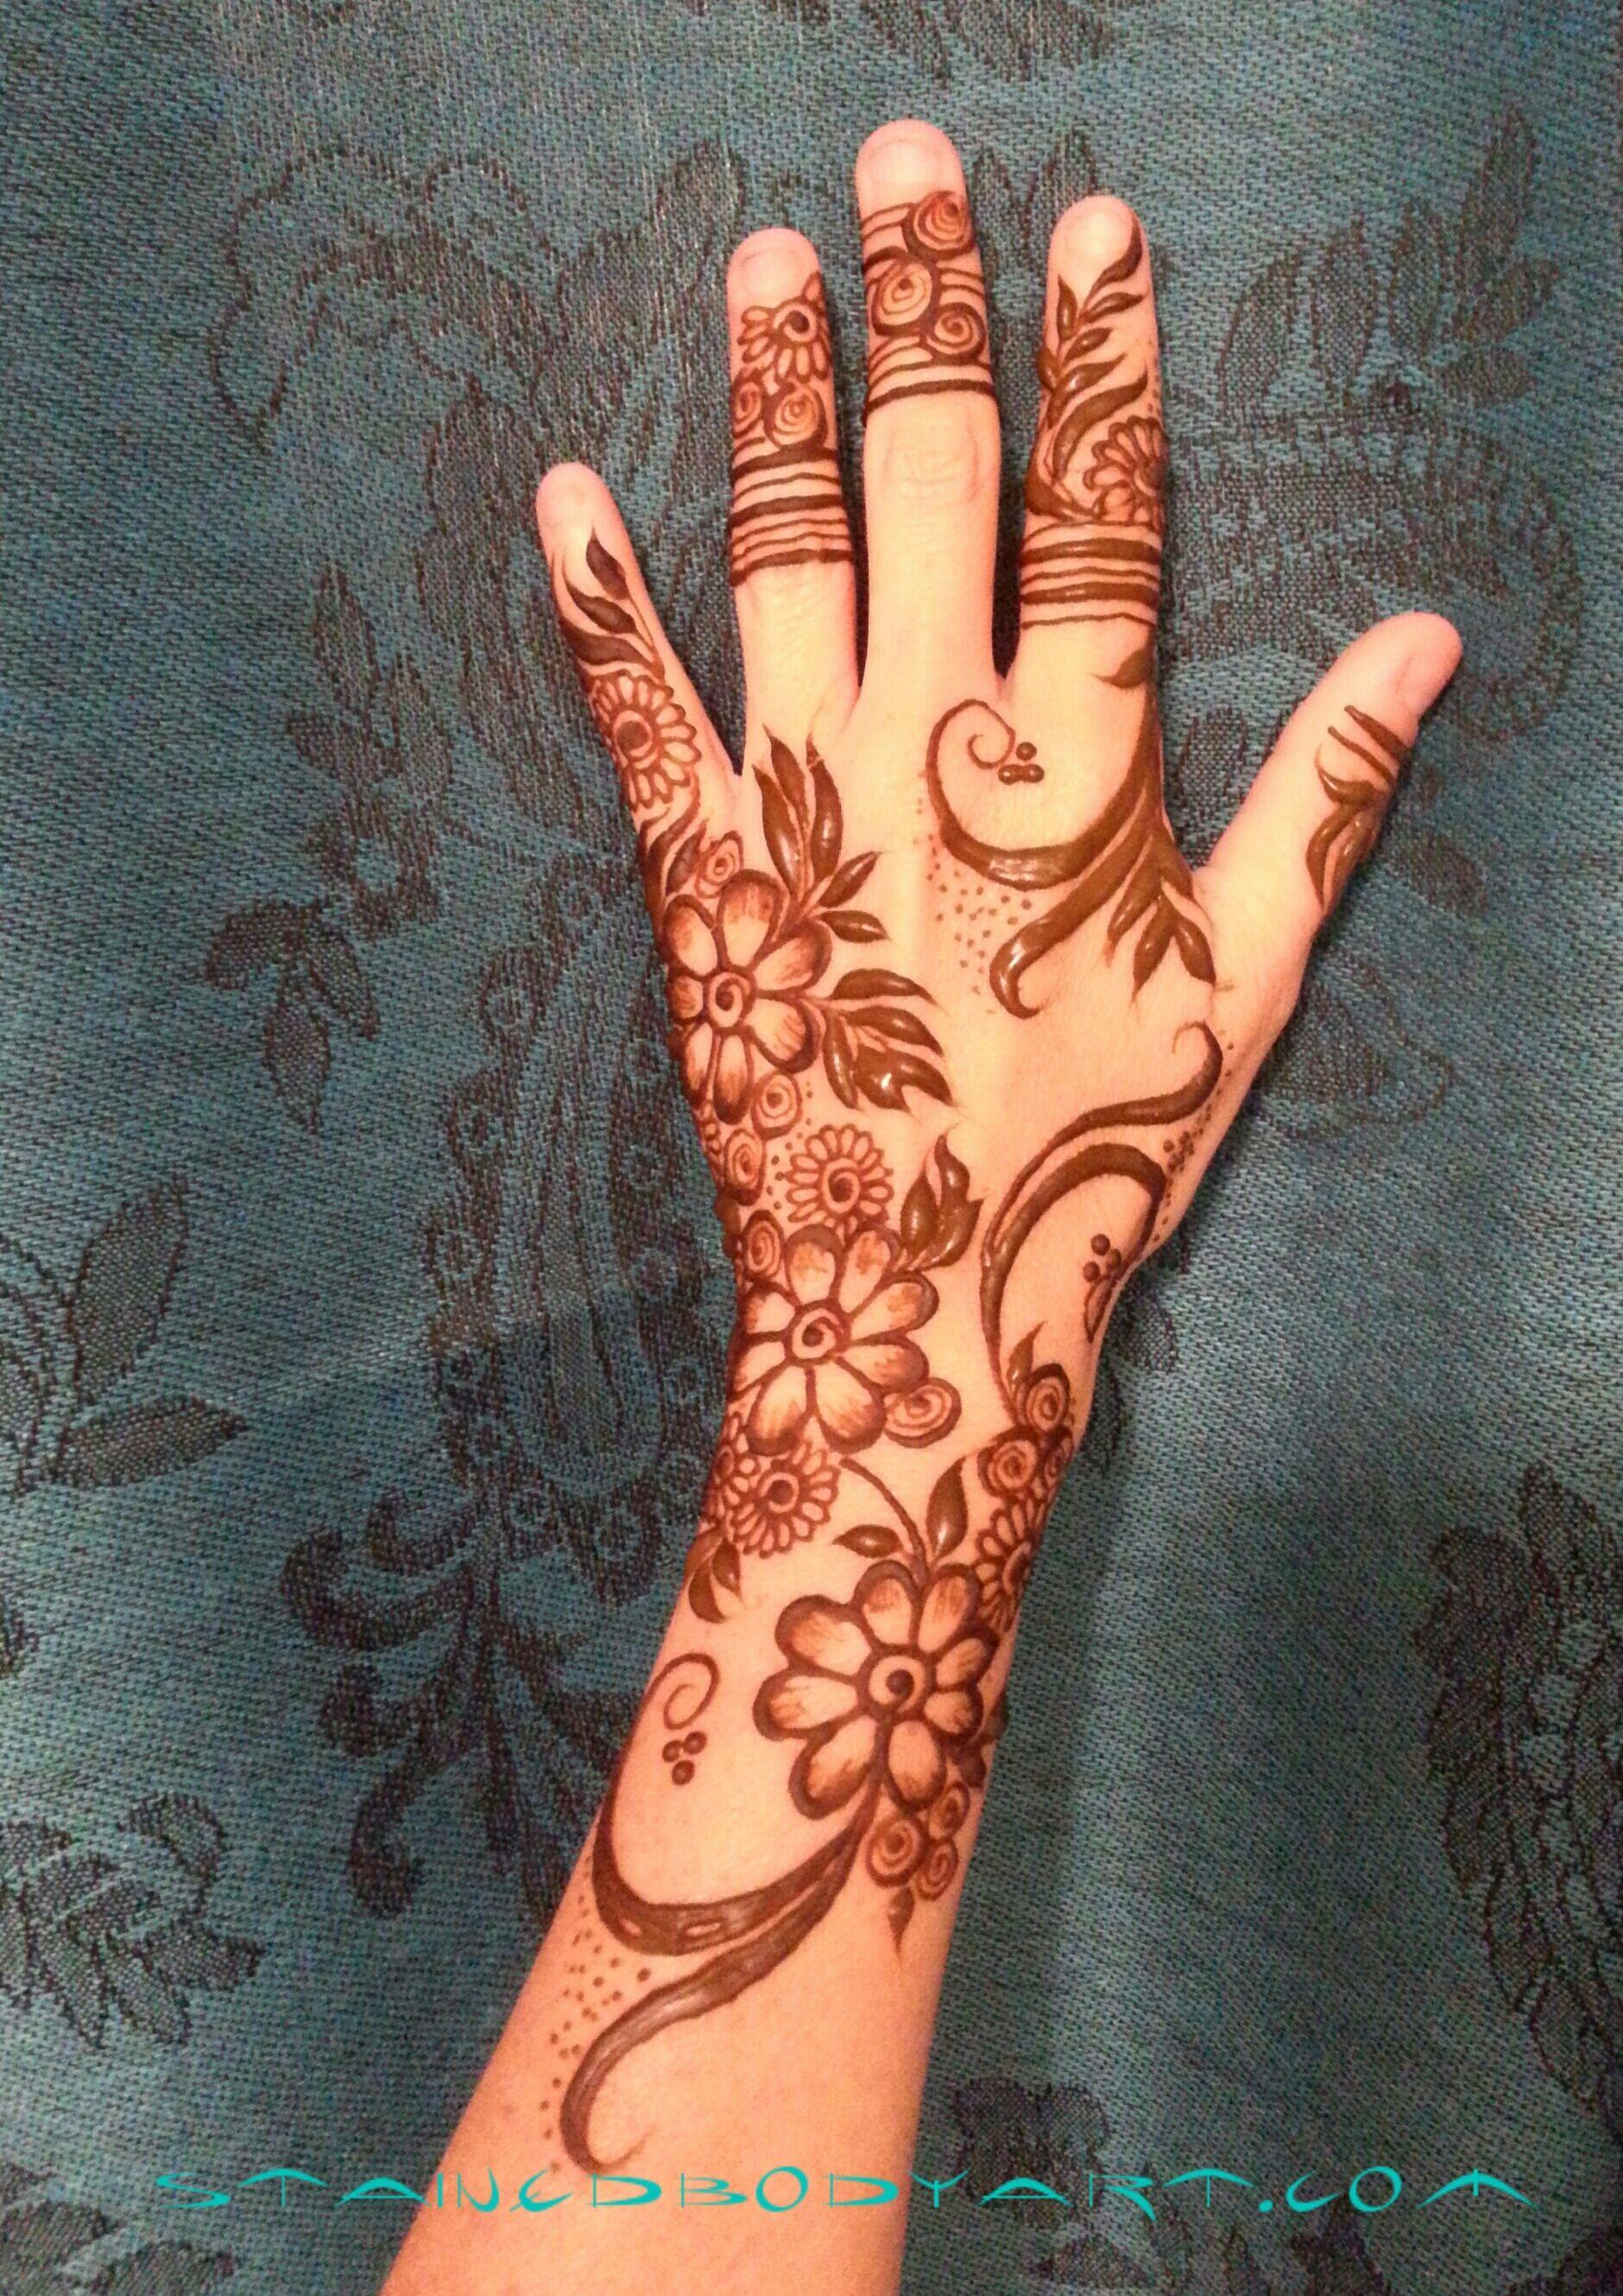 Gulf / khaleeji style henna / mehndi girly 7enna